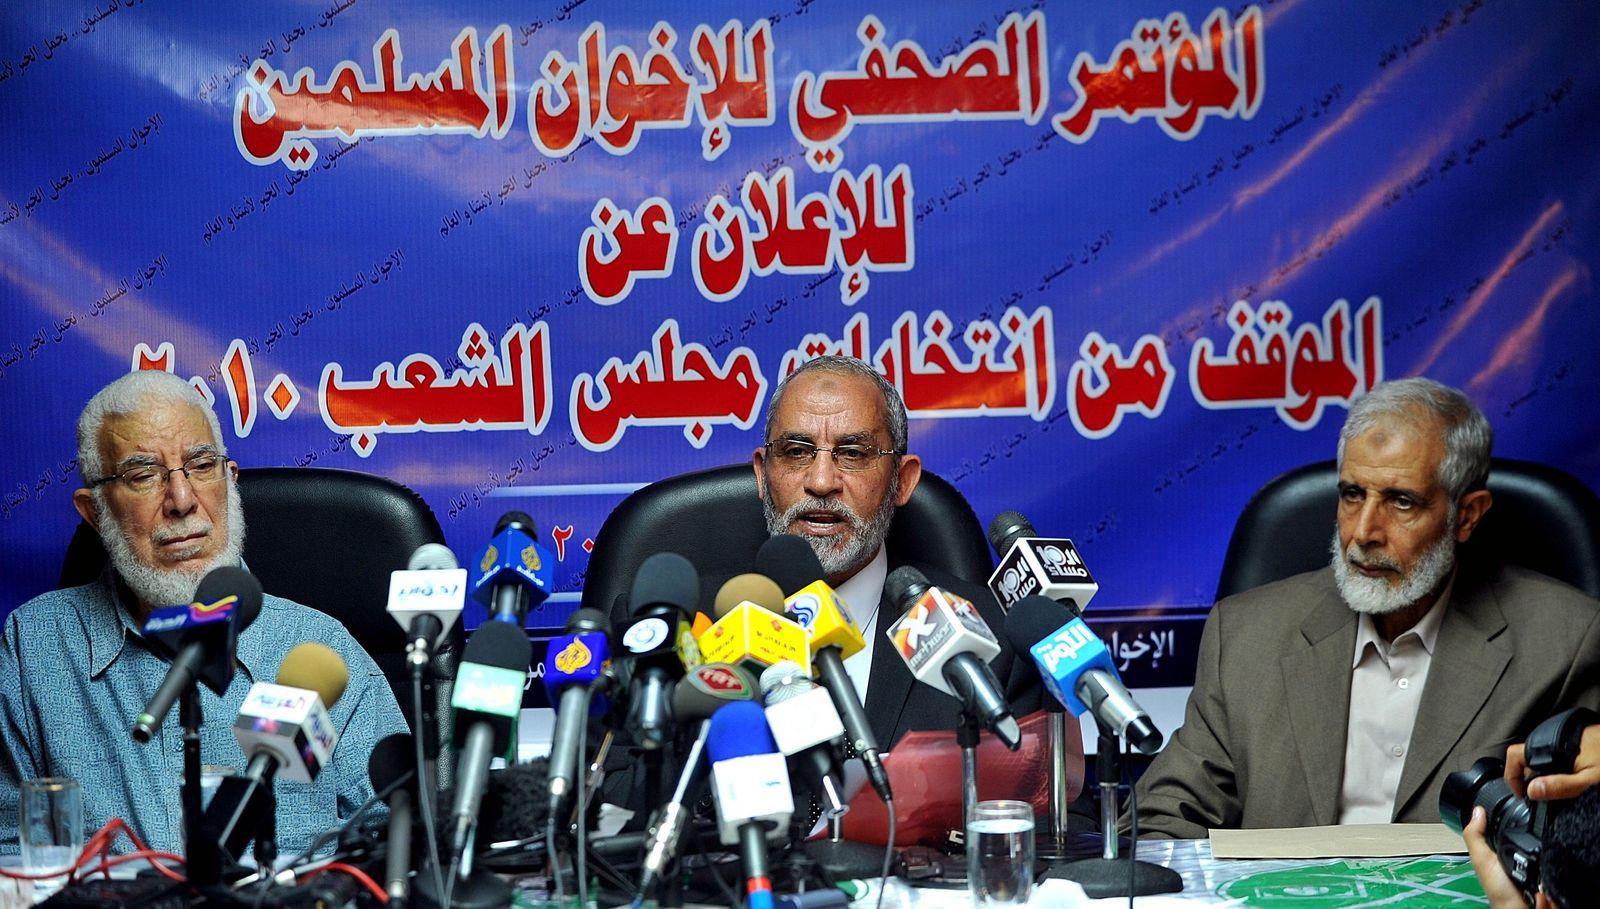 Ägyptische Muslimbruderschaft will sich an Wahlen beteiligen